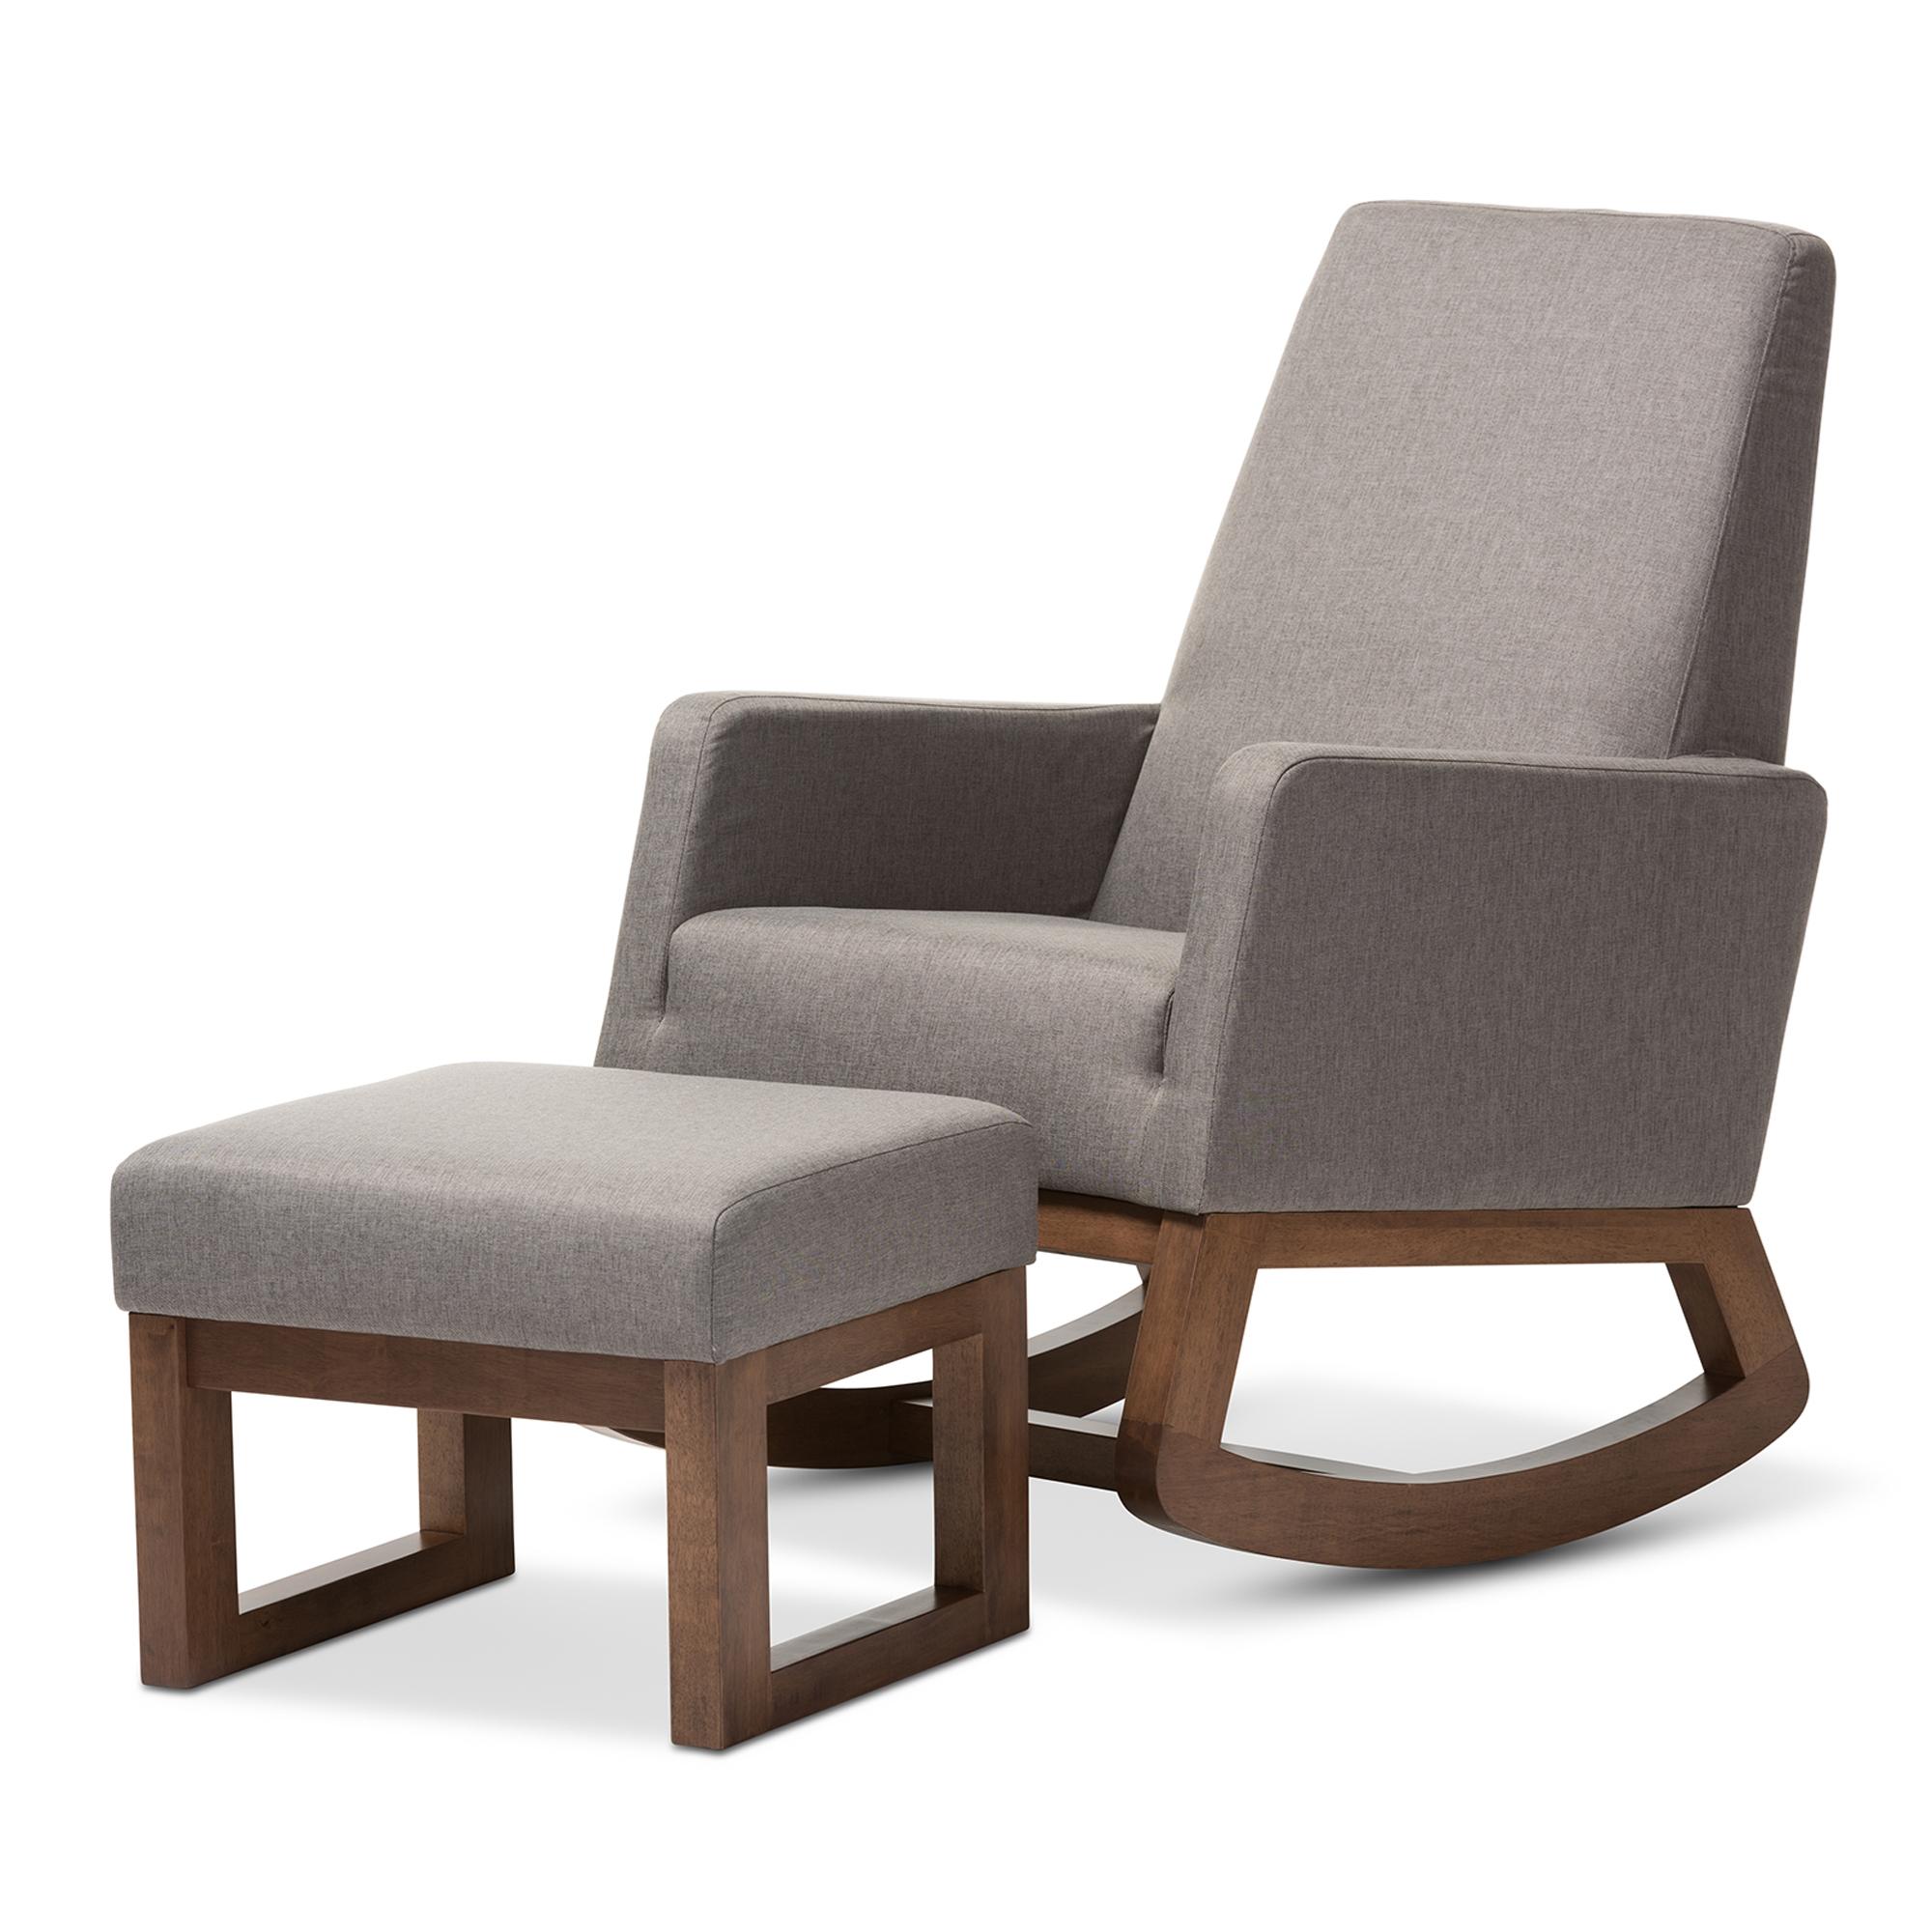 Beau Baxton Studio Yashiya Mid Century Retro Modern Grey Fabric Upholstered  Rocking Chair And Ottoman Set